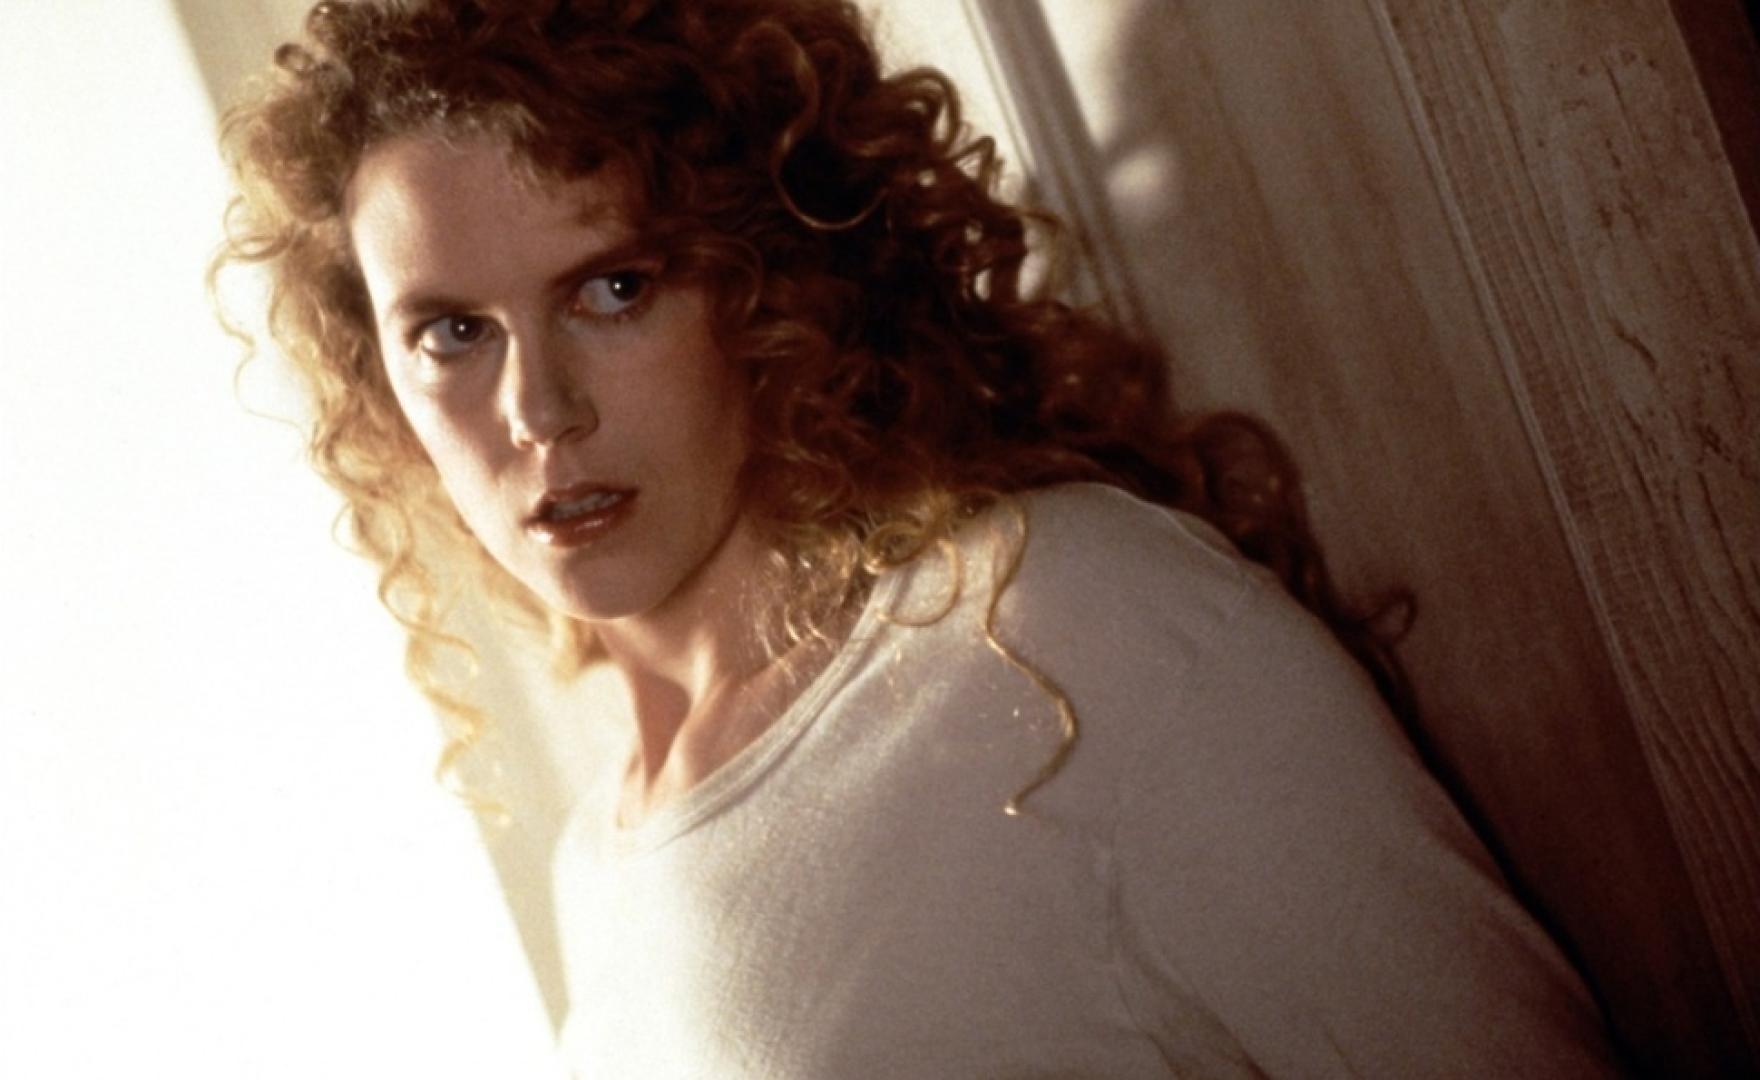 Malice - Bűvölet (1993)